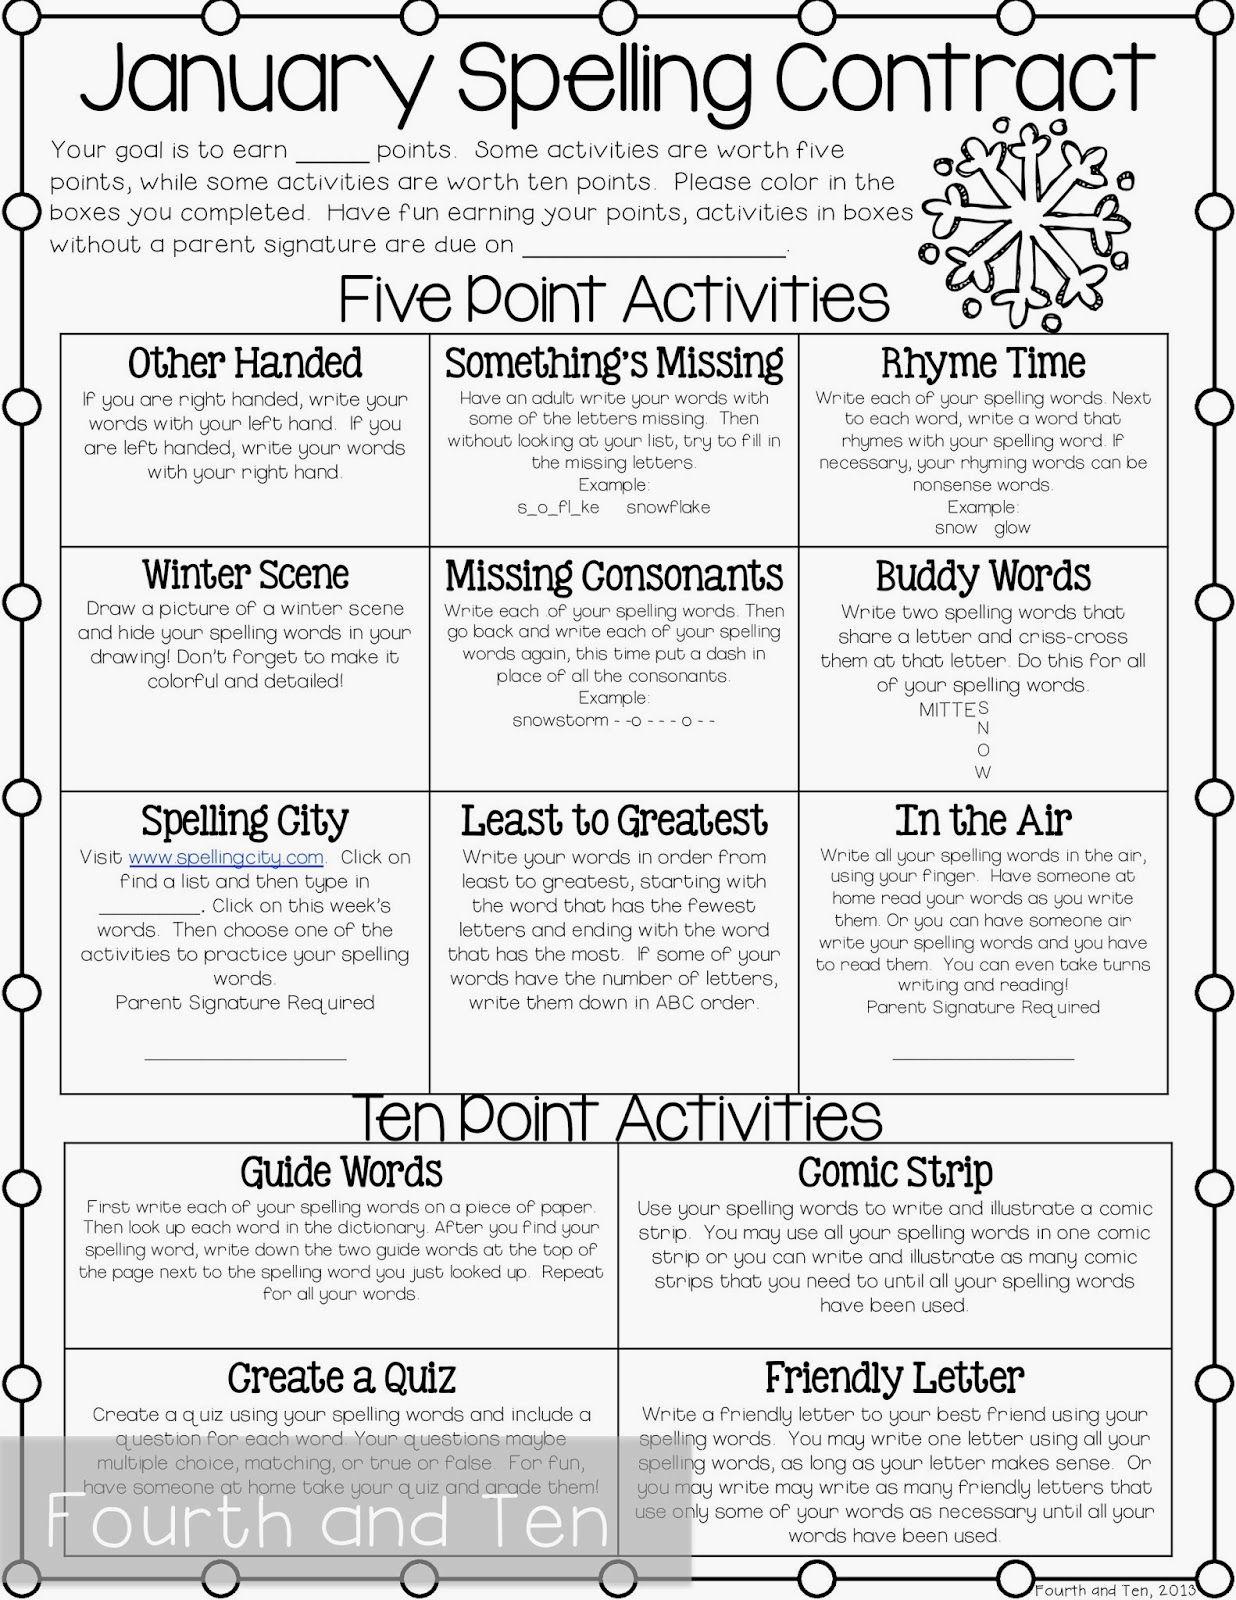 worksheet Spelling Homework Worksheets 78 best images about spelling homework on pinterest lists and homework